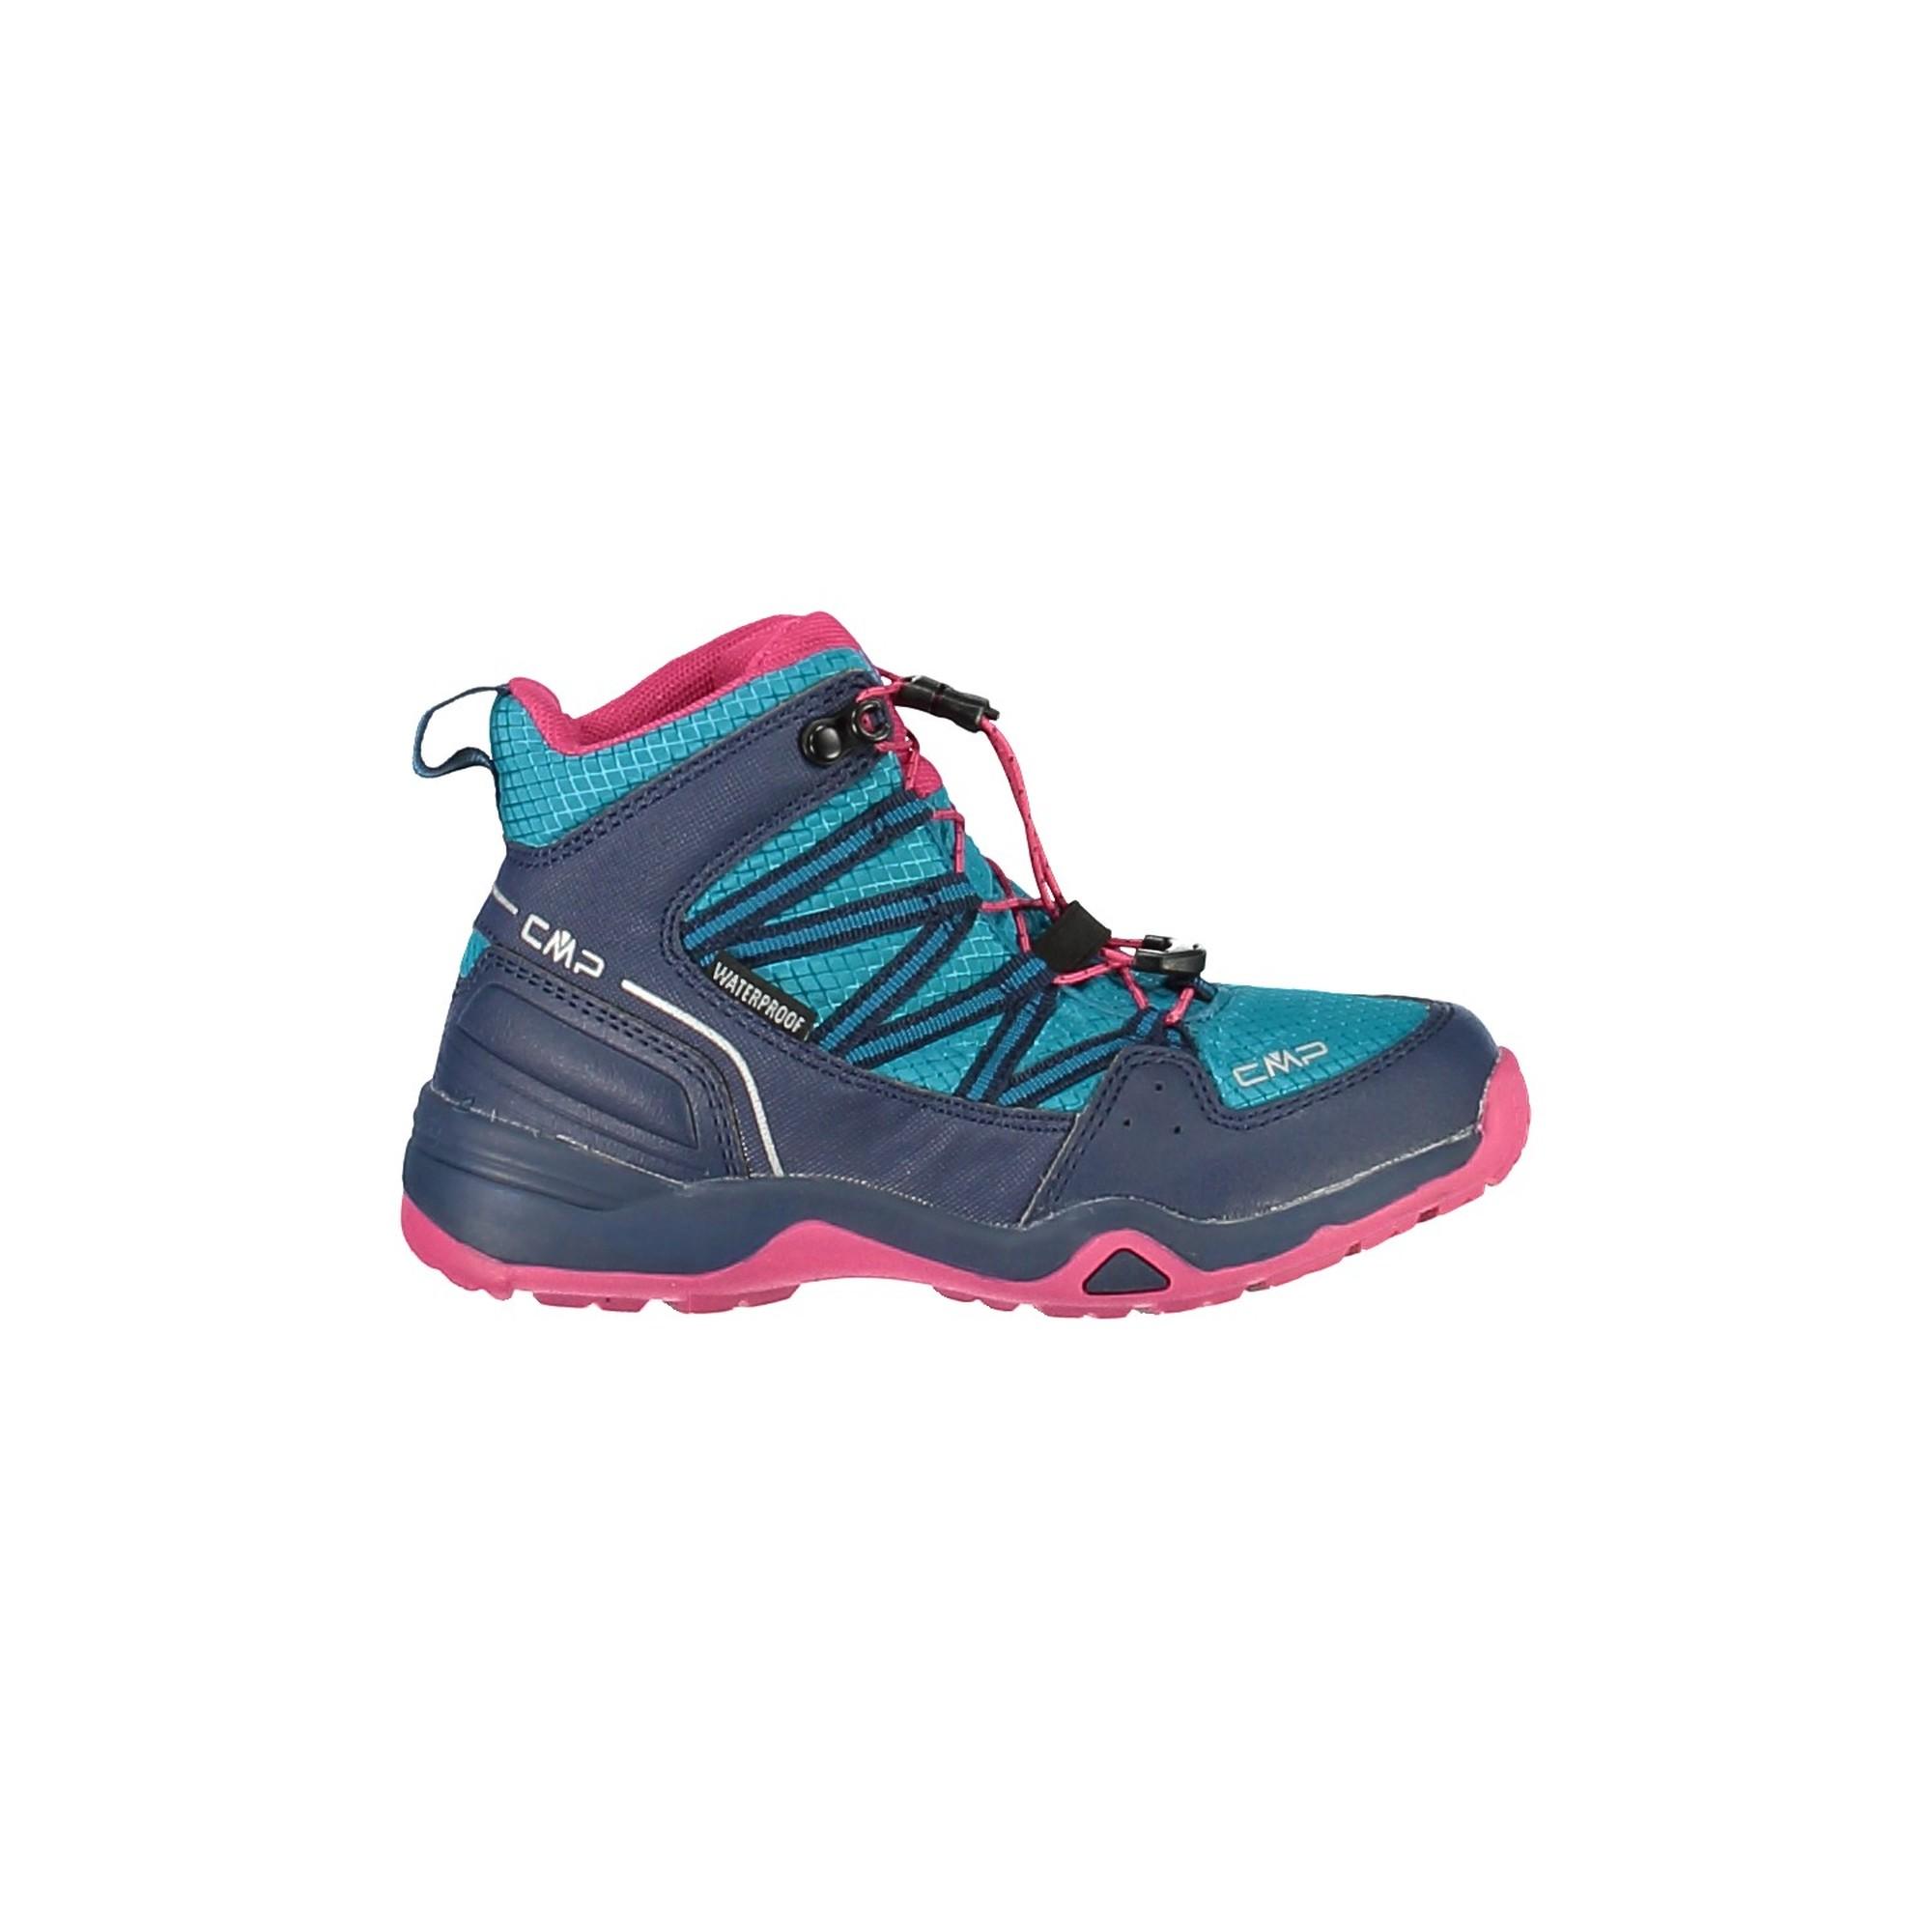 Details about CMP Shoes Walking Leisure Kids Sirius Mid Trekking WP blau show original title